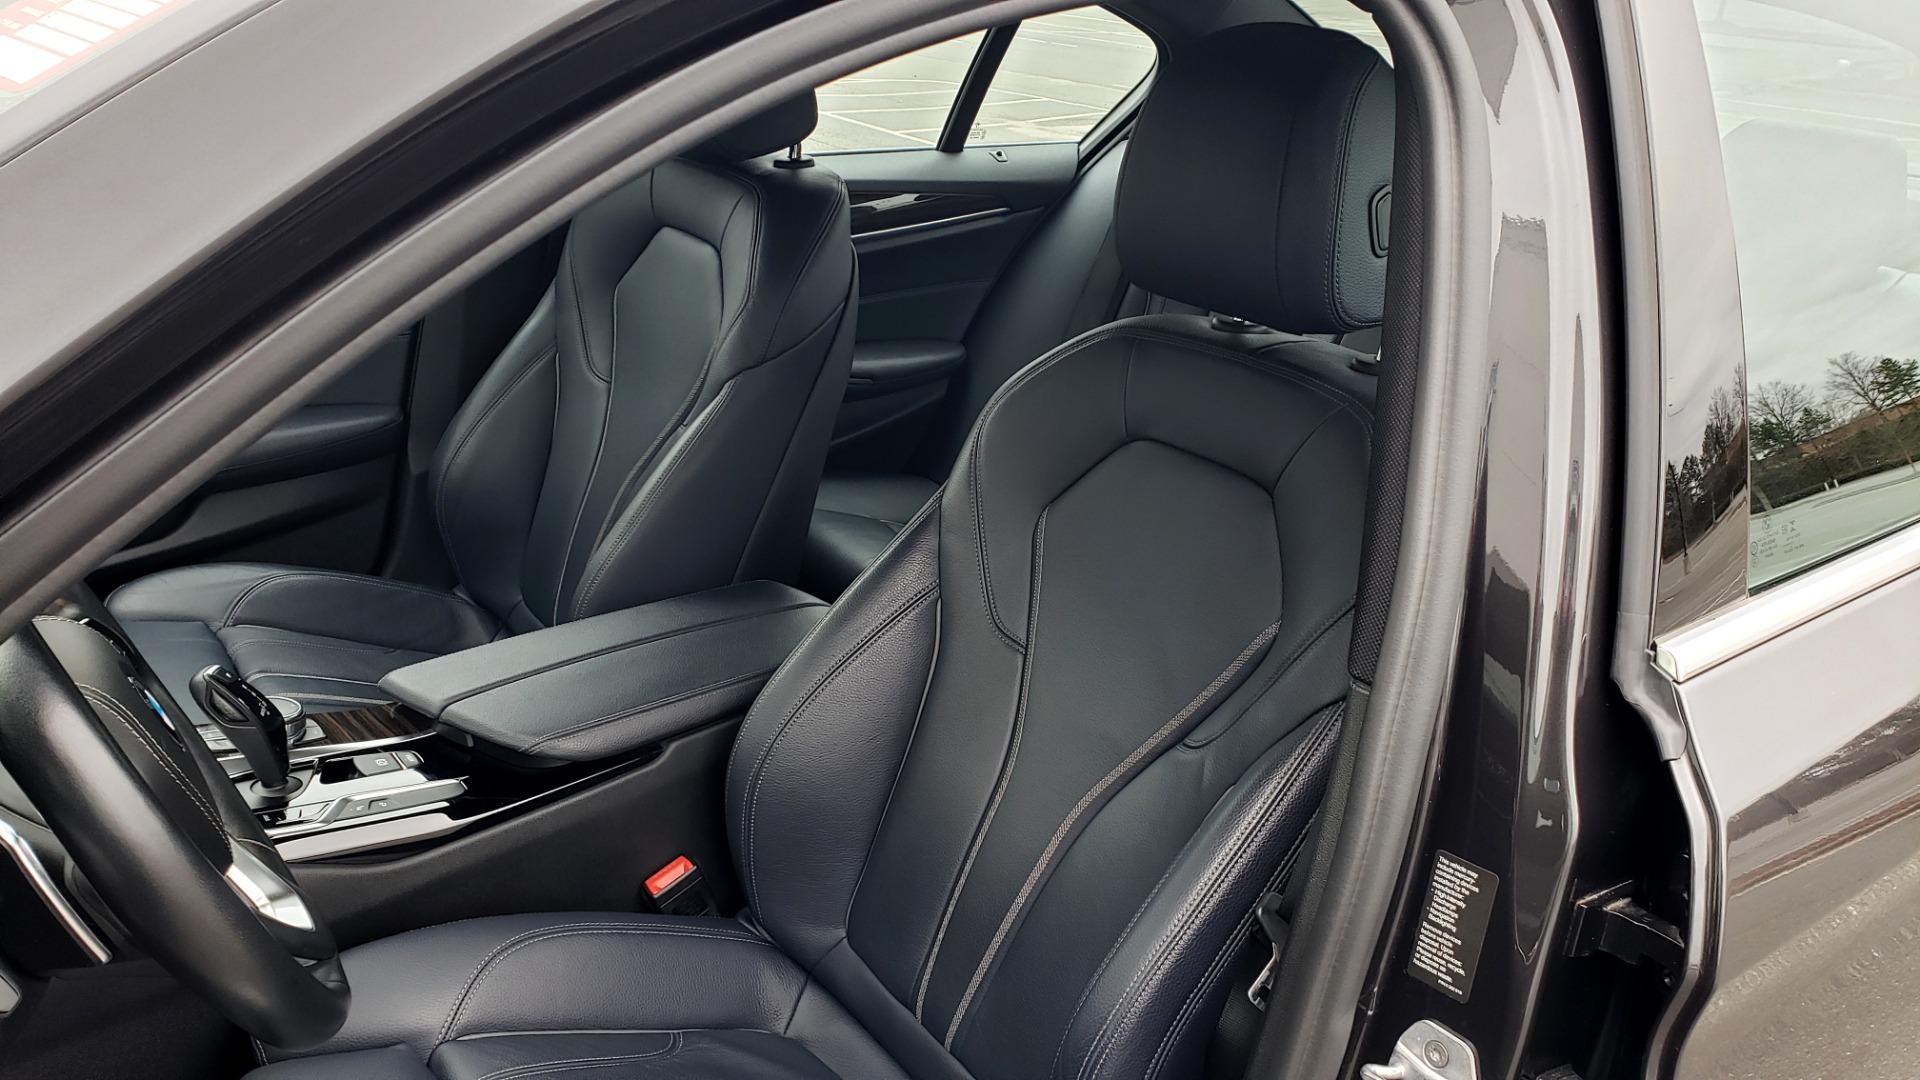 Used 2017 BMW 5 SERIES 530IXDRIVE / PREM PKG / DRVR ASST PLUS / CLD WTHR / APPLE CARPLAY for sale Sold at Formula Imports in Charlotte NC 28227 34